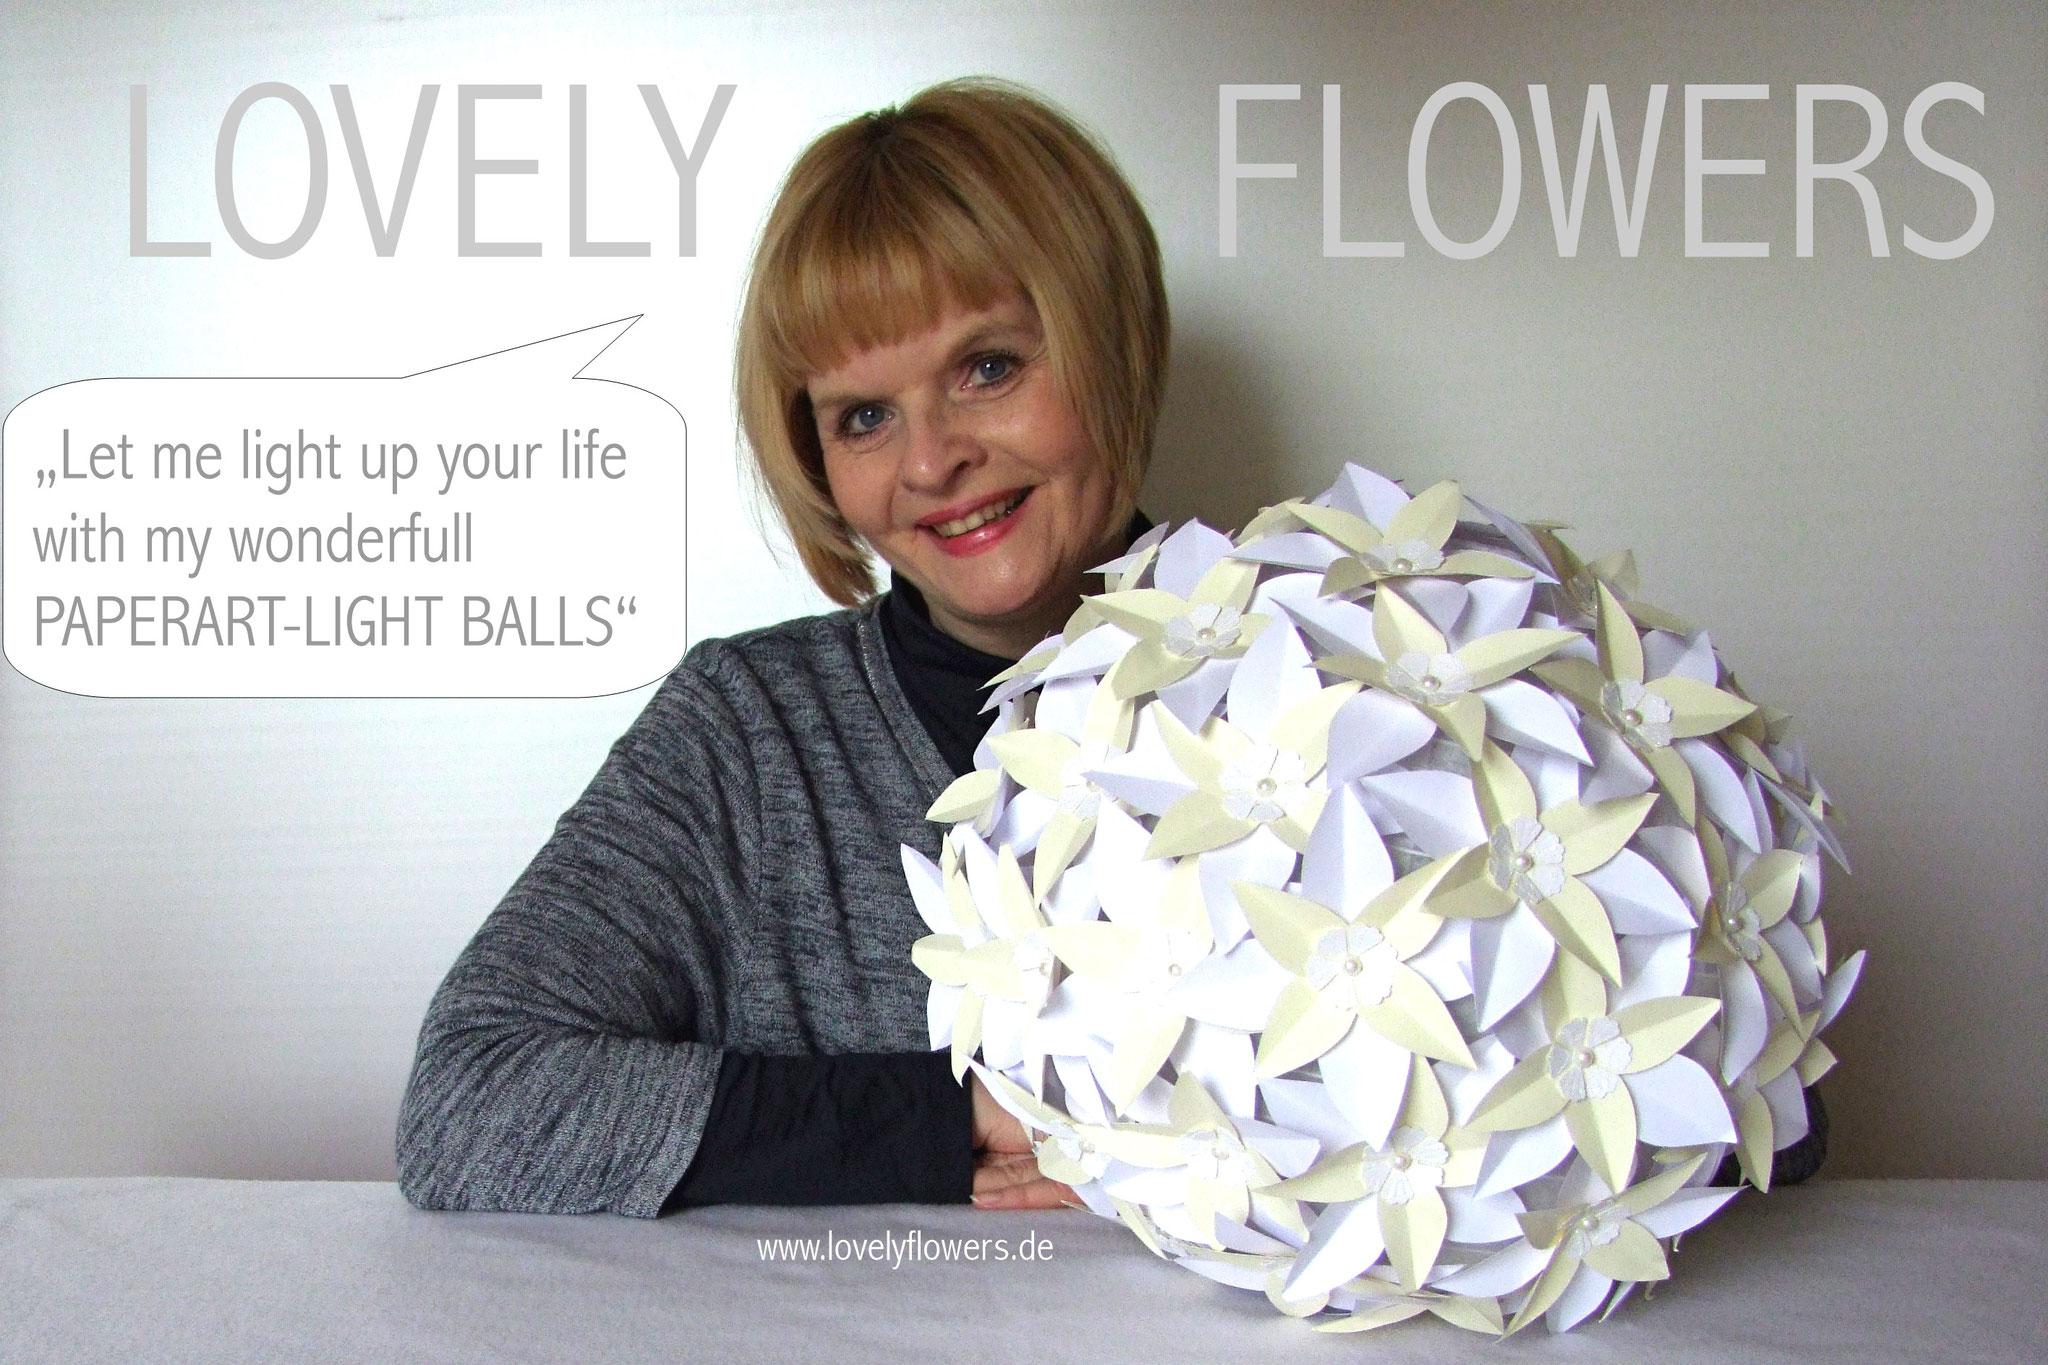 www.lovelyflowers.de - Paper Art Lampen gibt es mit vielen Blütenformen!